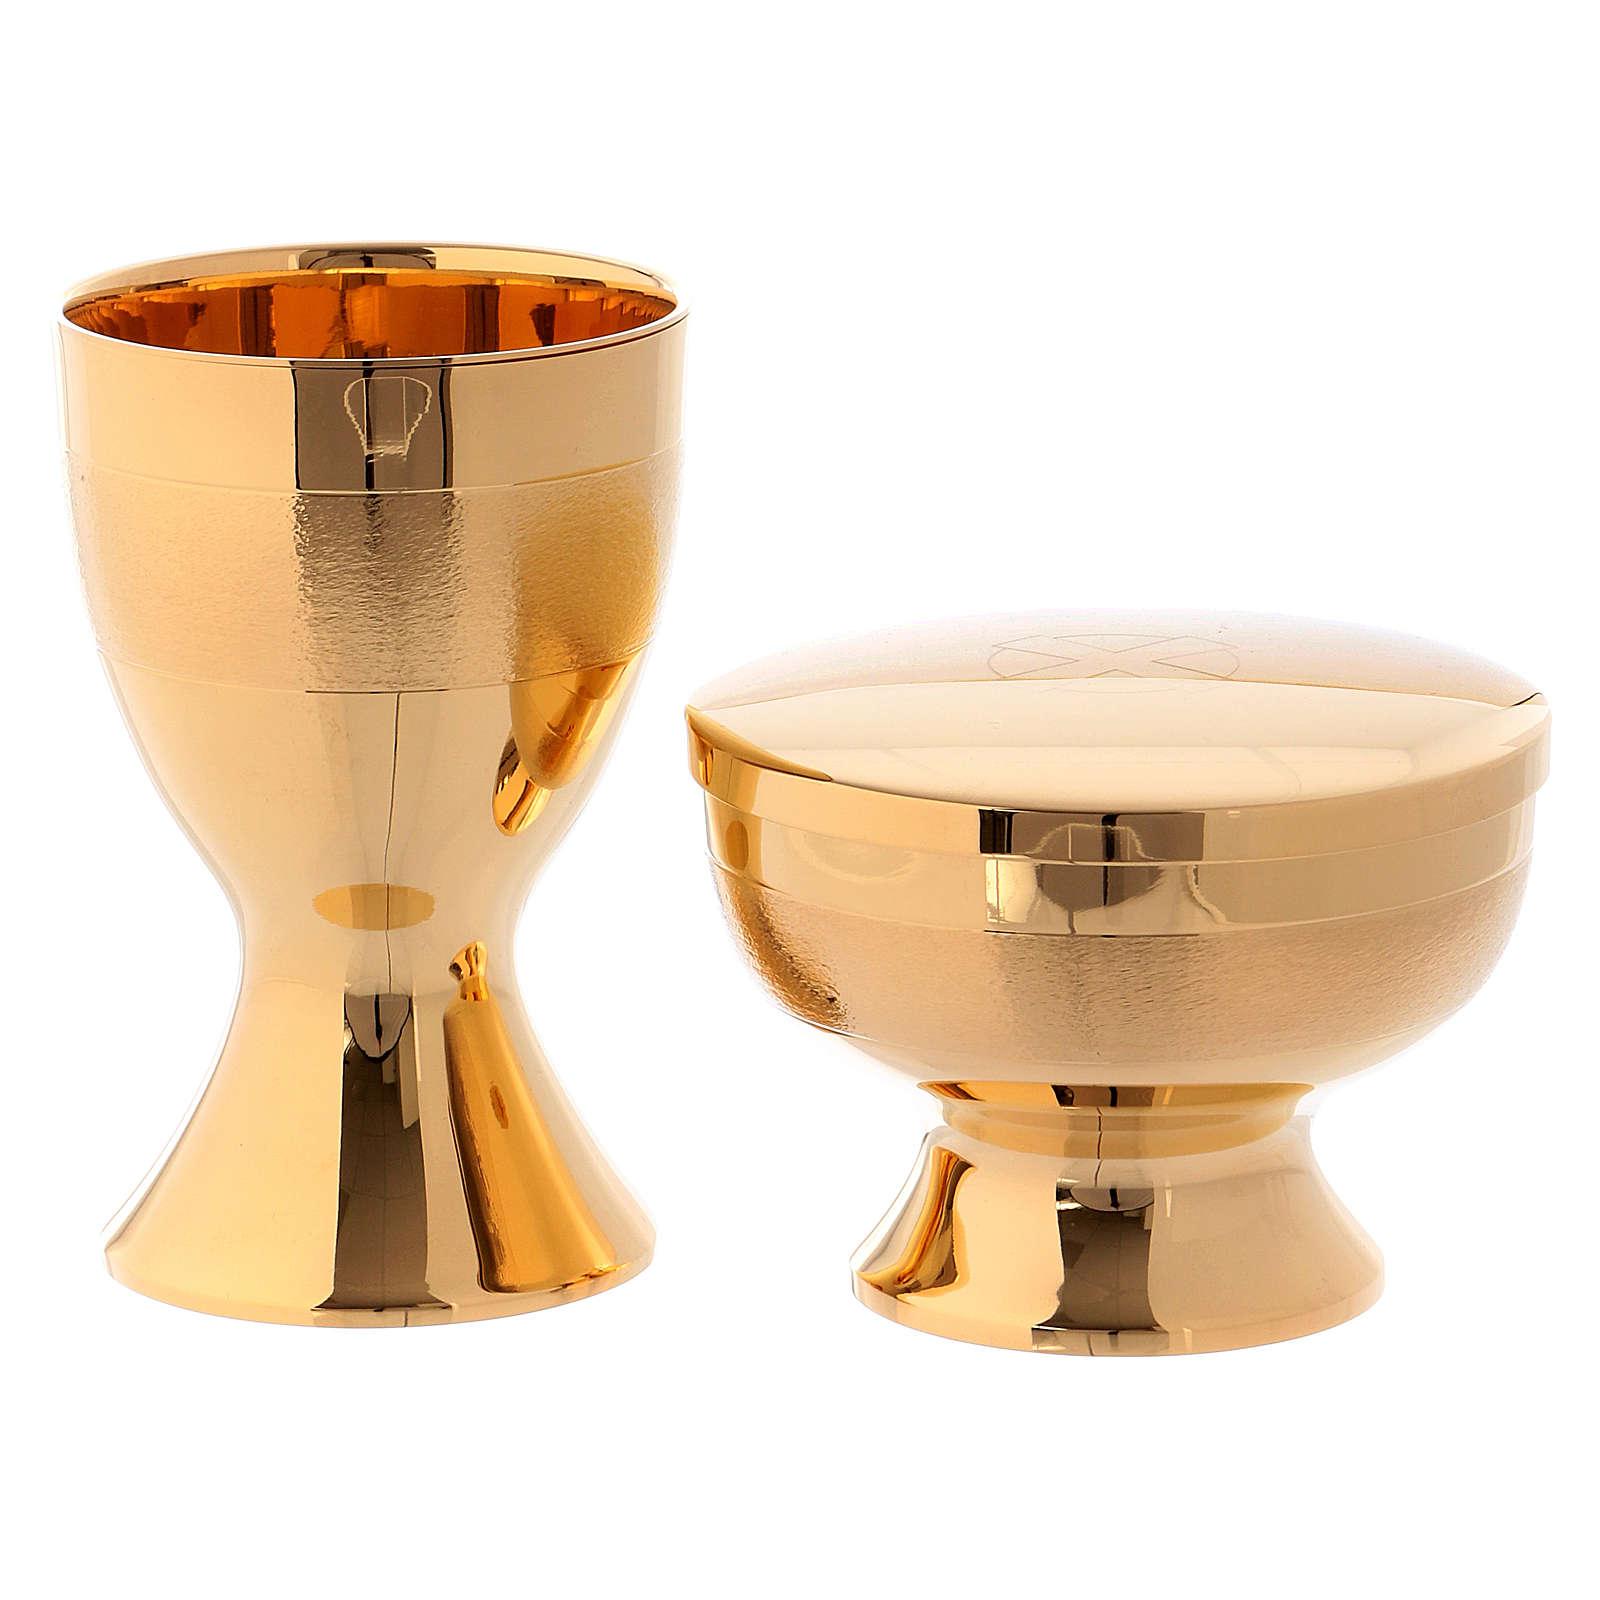 Maleta con artículos para celebración latón dorado Molina 3